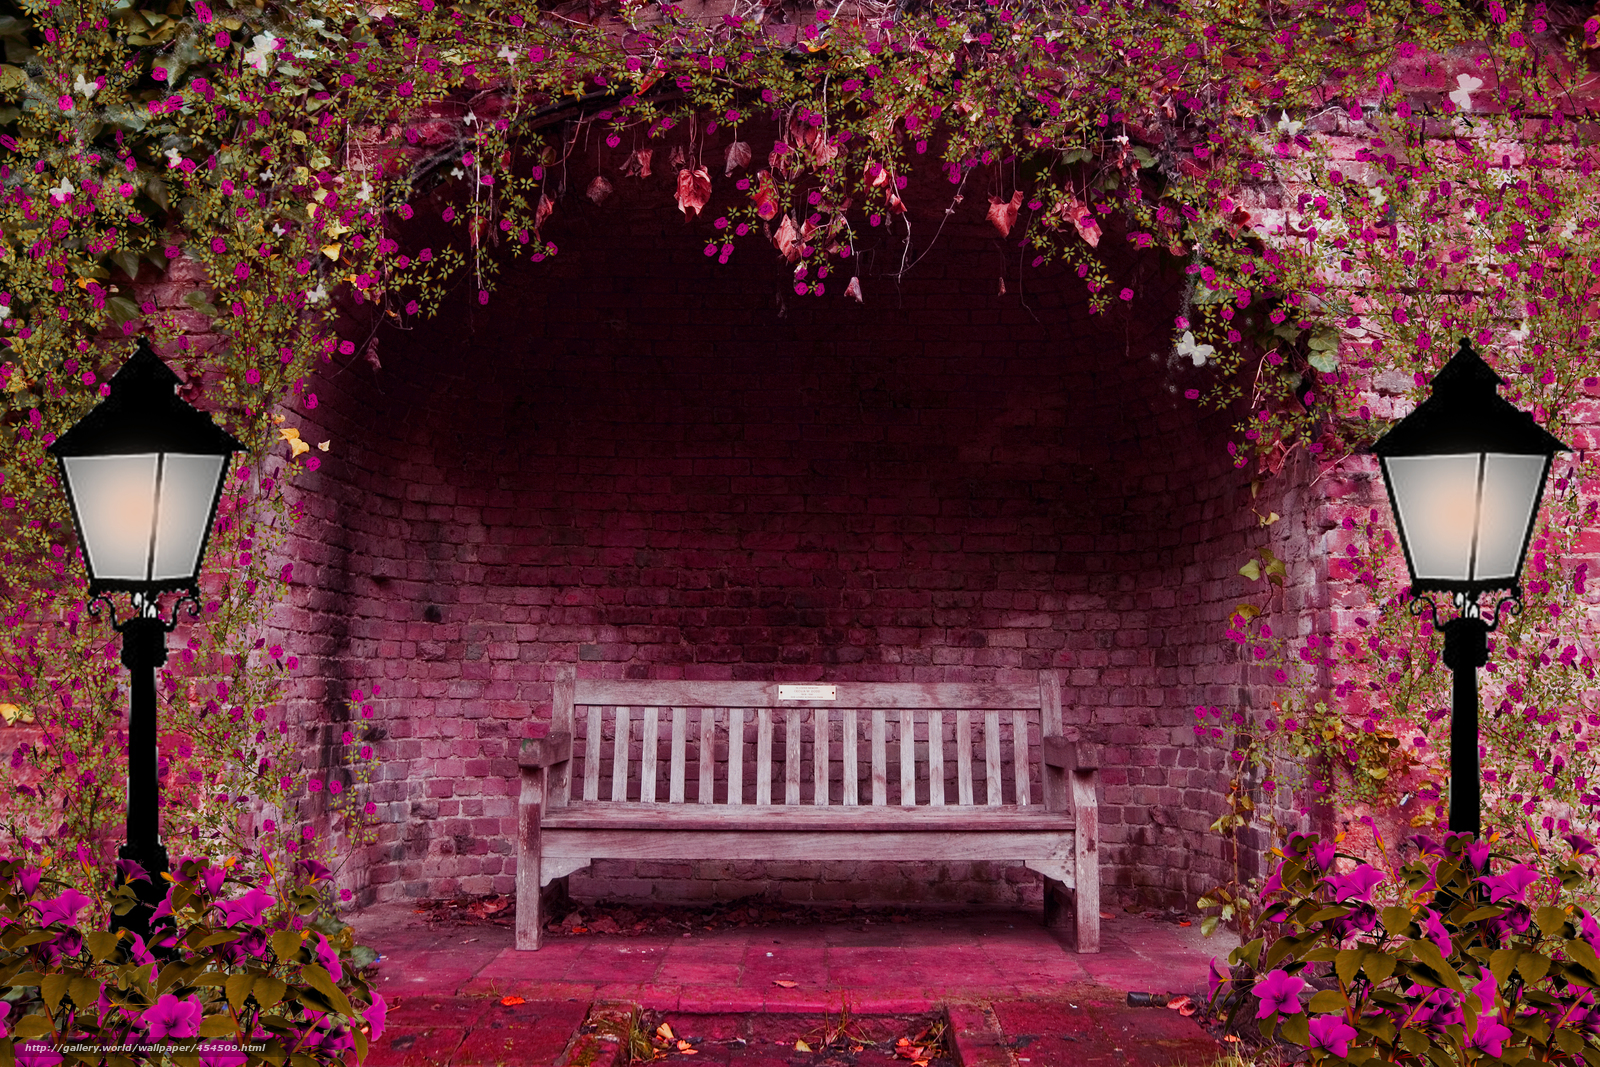 flores jardim primavera:Spring Garden Bench